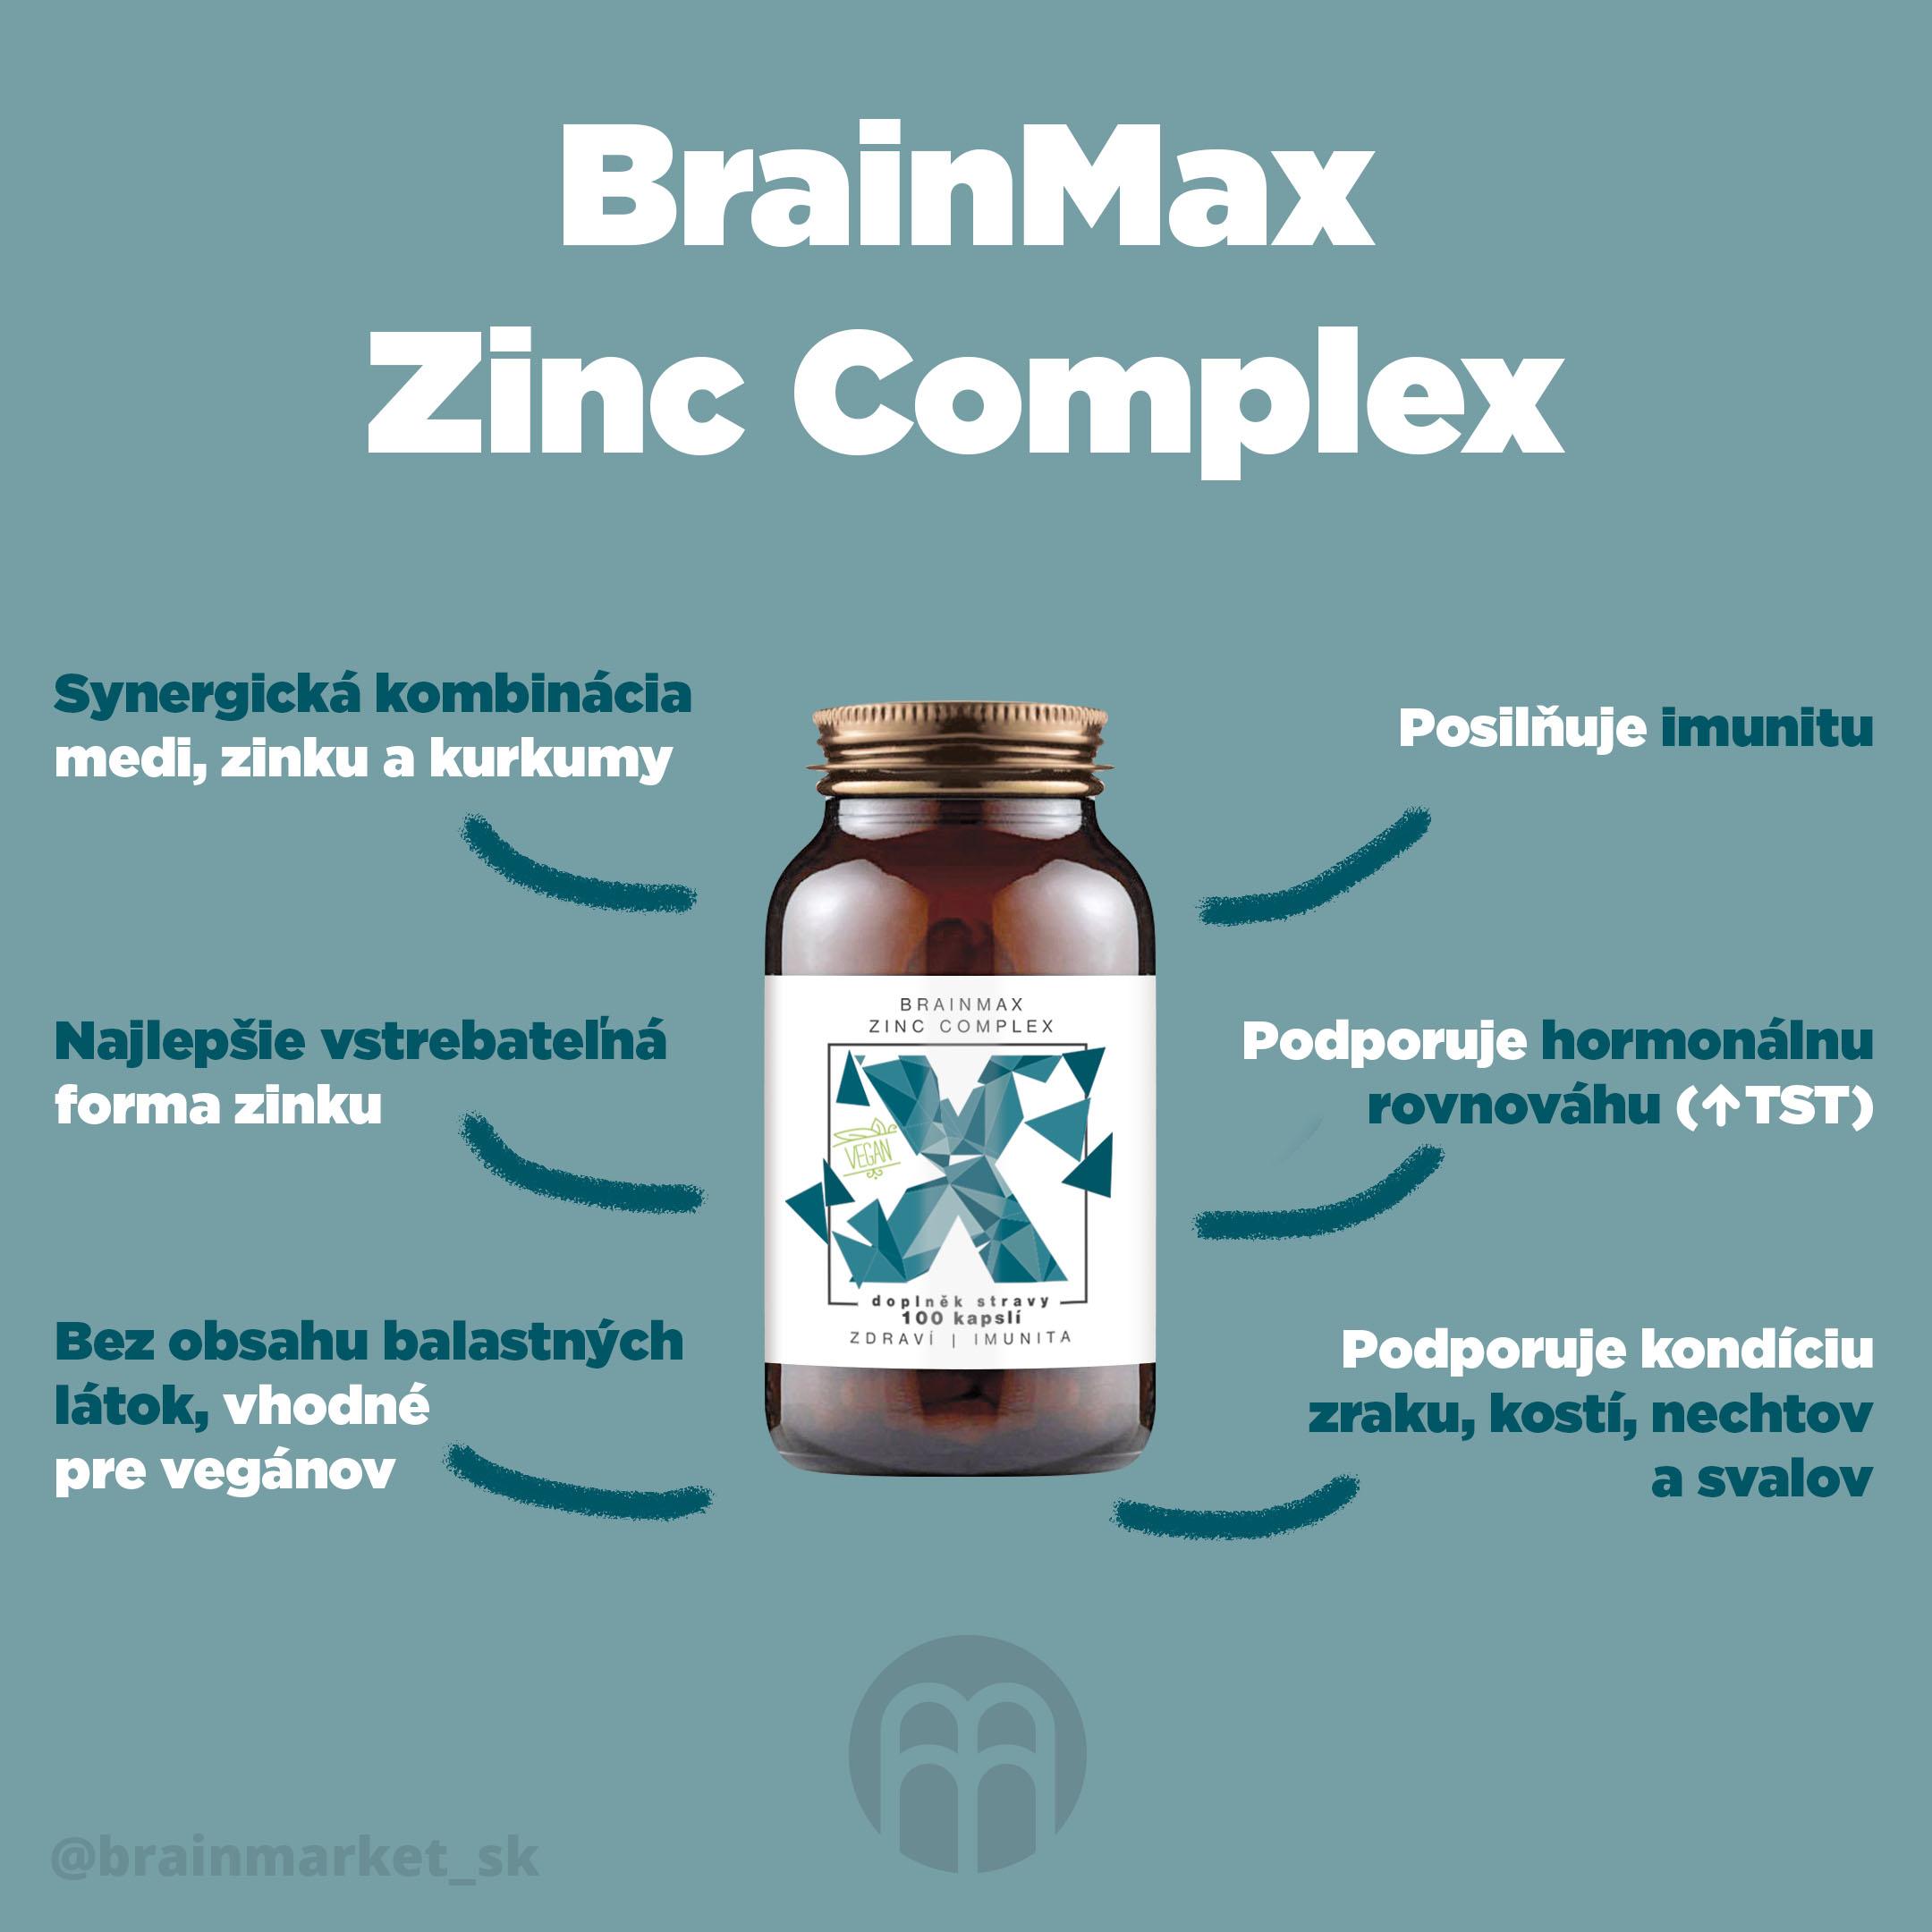 brainmax_zinc_complex_ucinky_Infografika-BrainMarket-2_SK